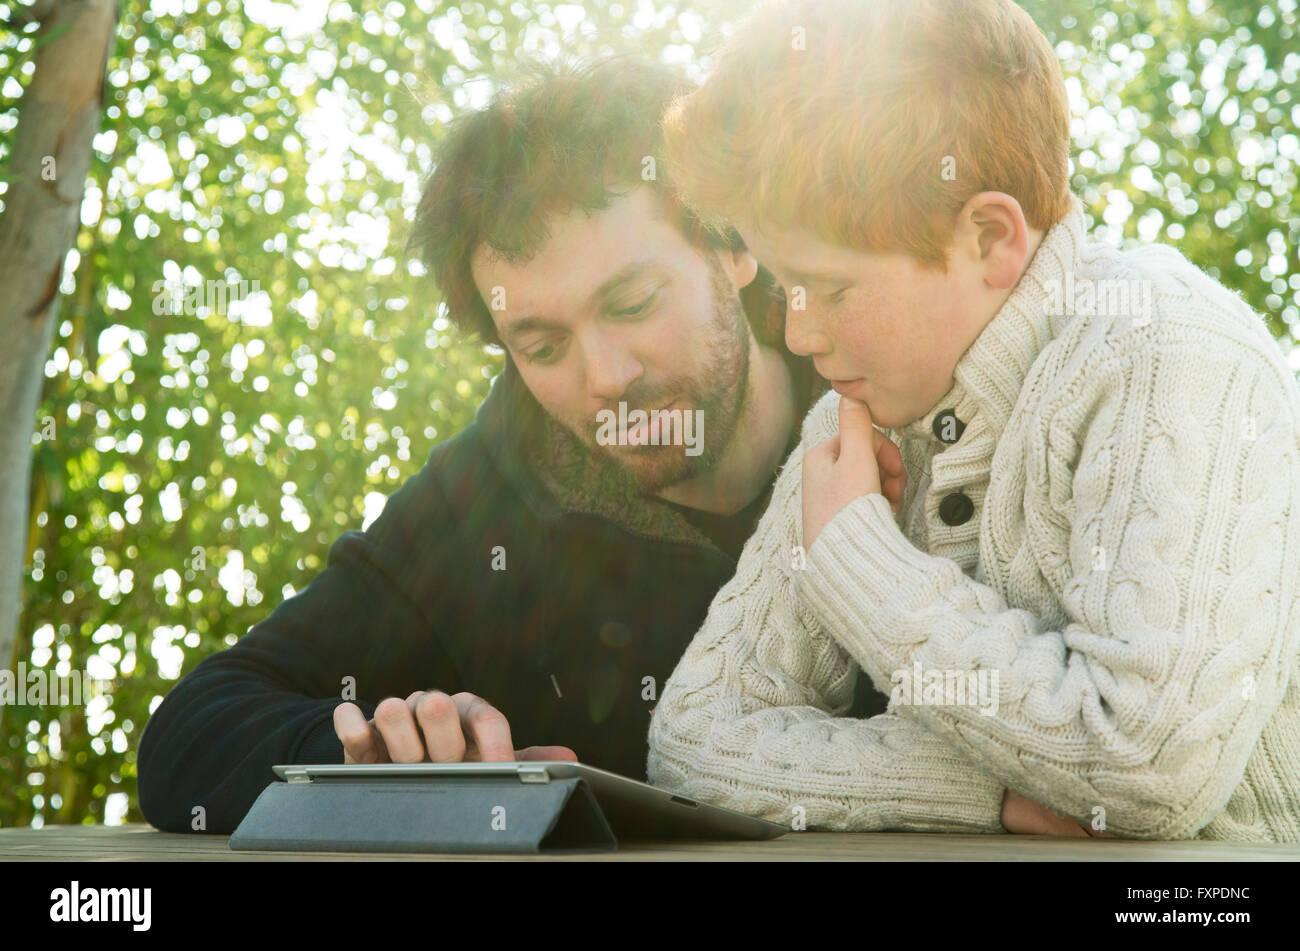 Vater und Sohn Blick auf digital-Tablette zusammen Stockbild